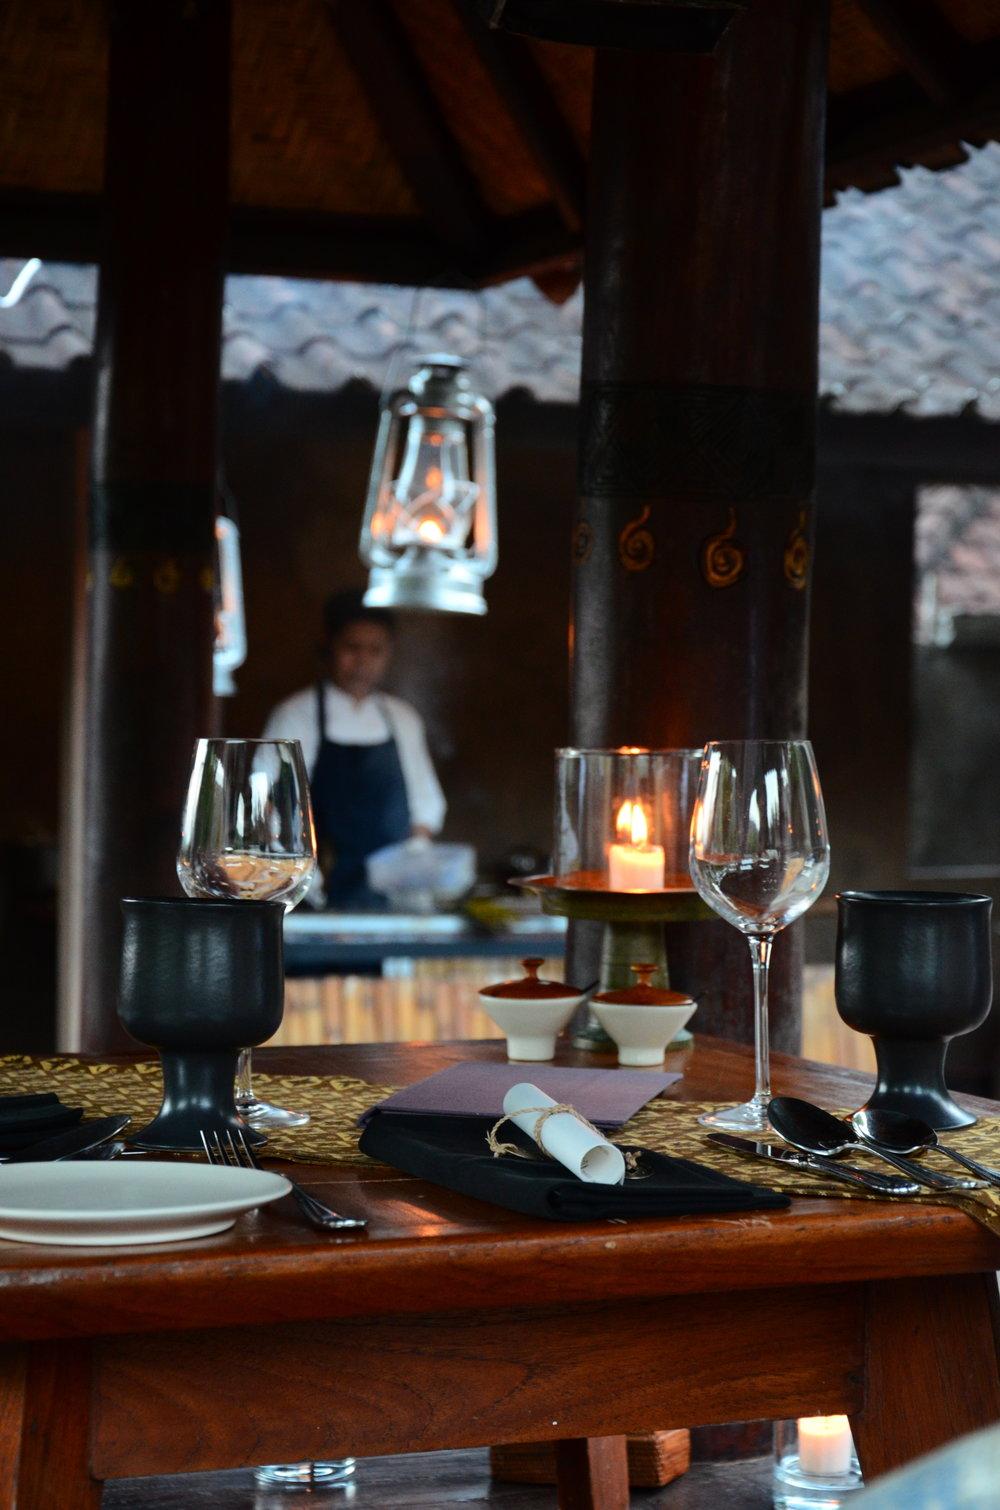 Alila Manggis - Bali Aga Dining Experience 01.JPG